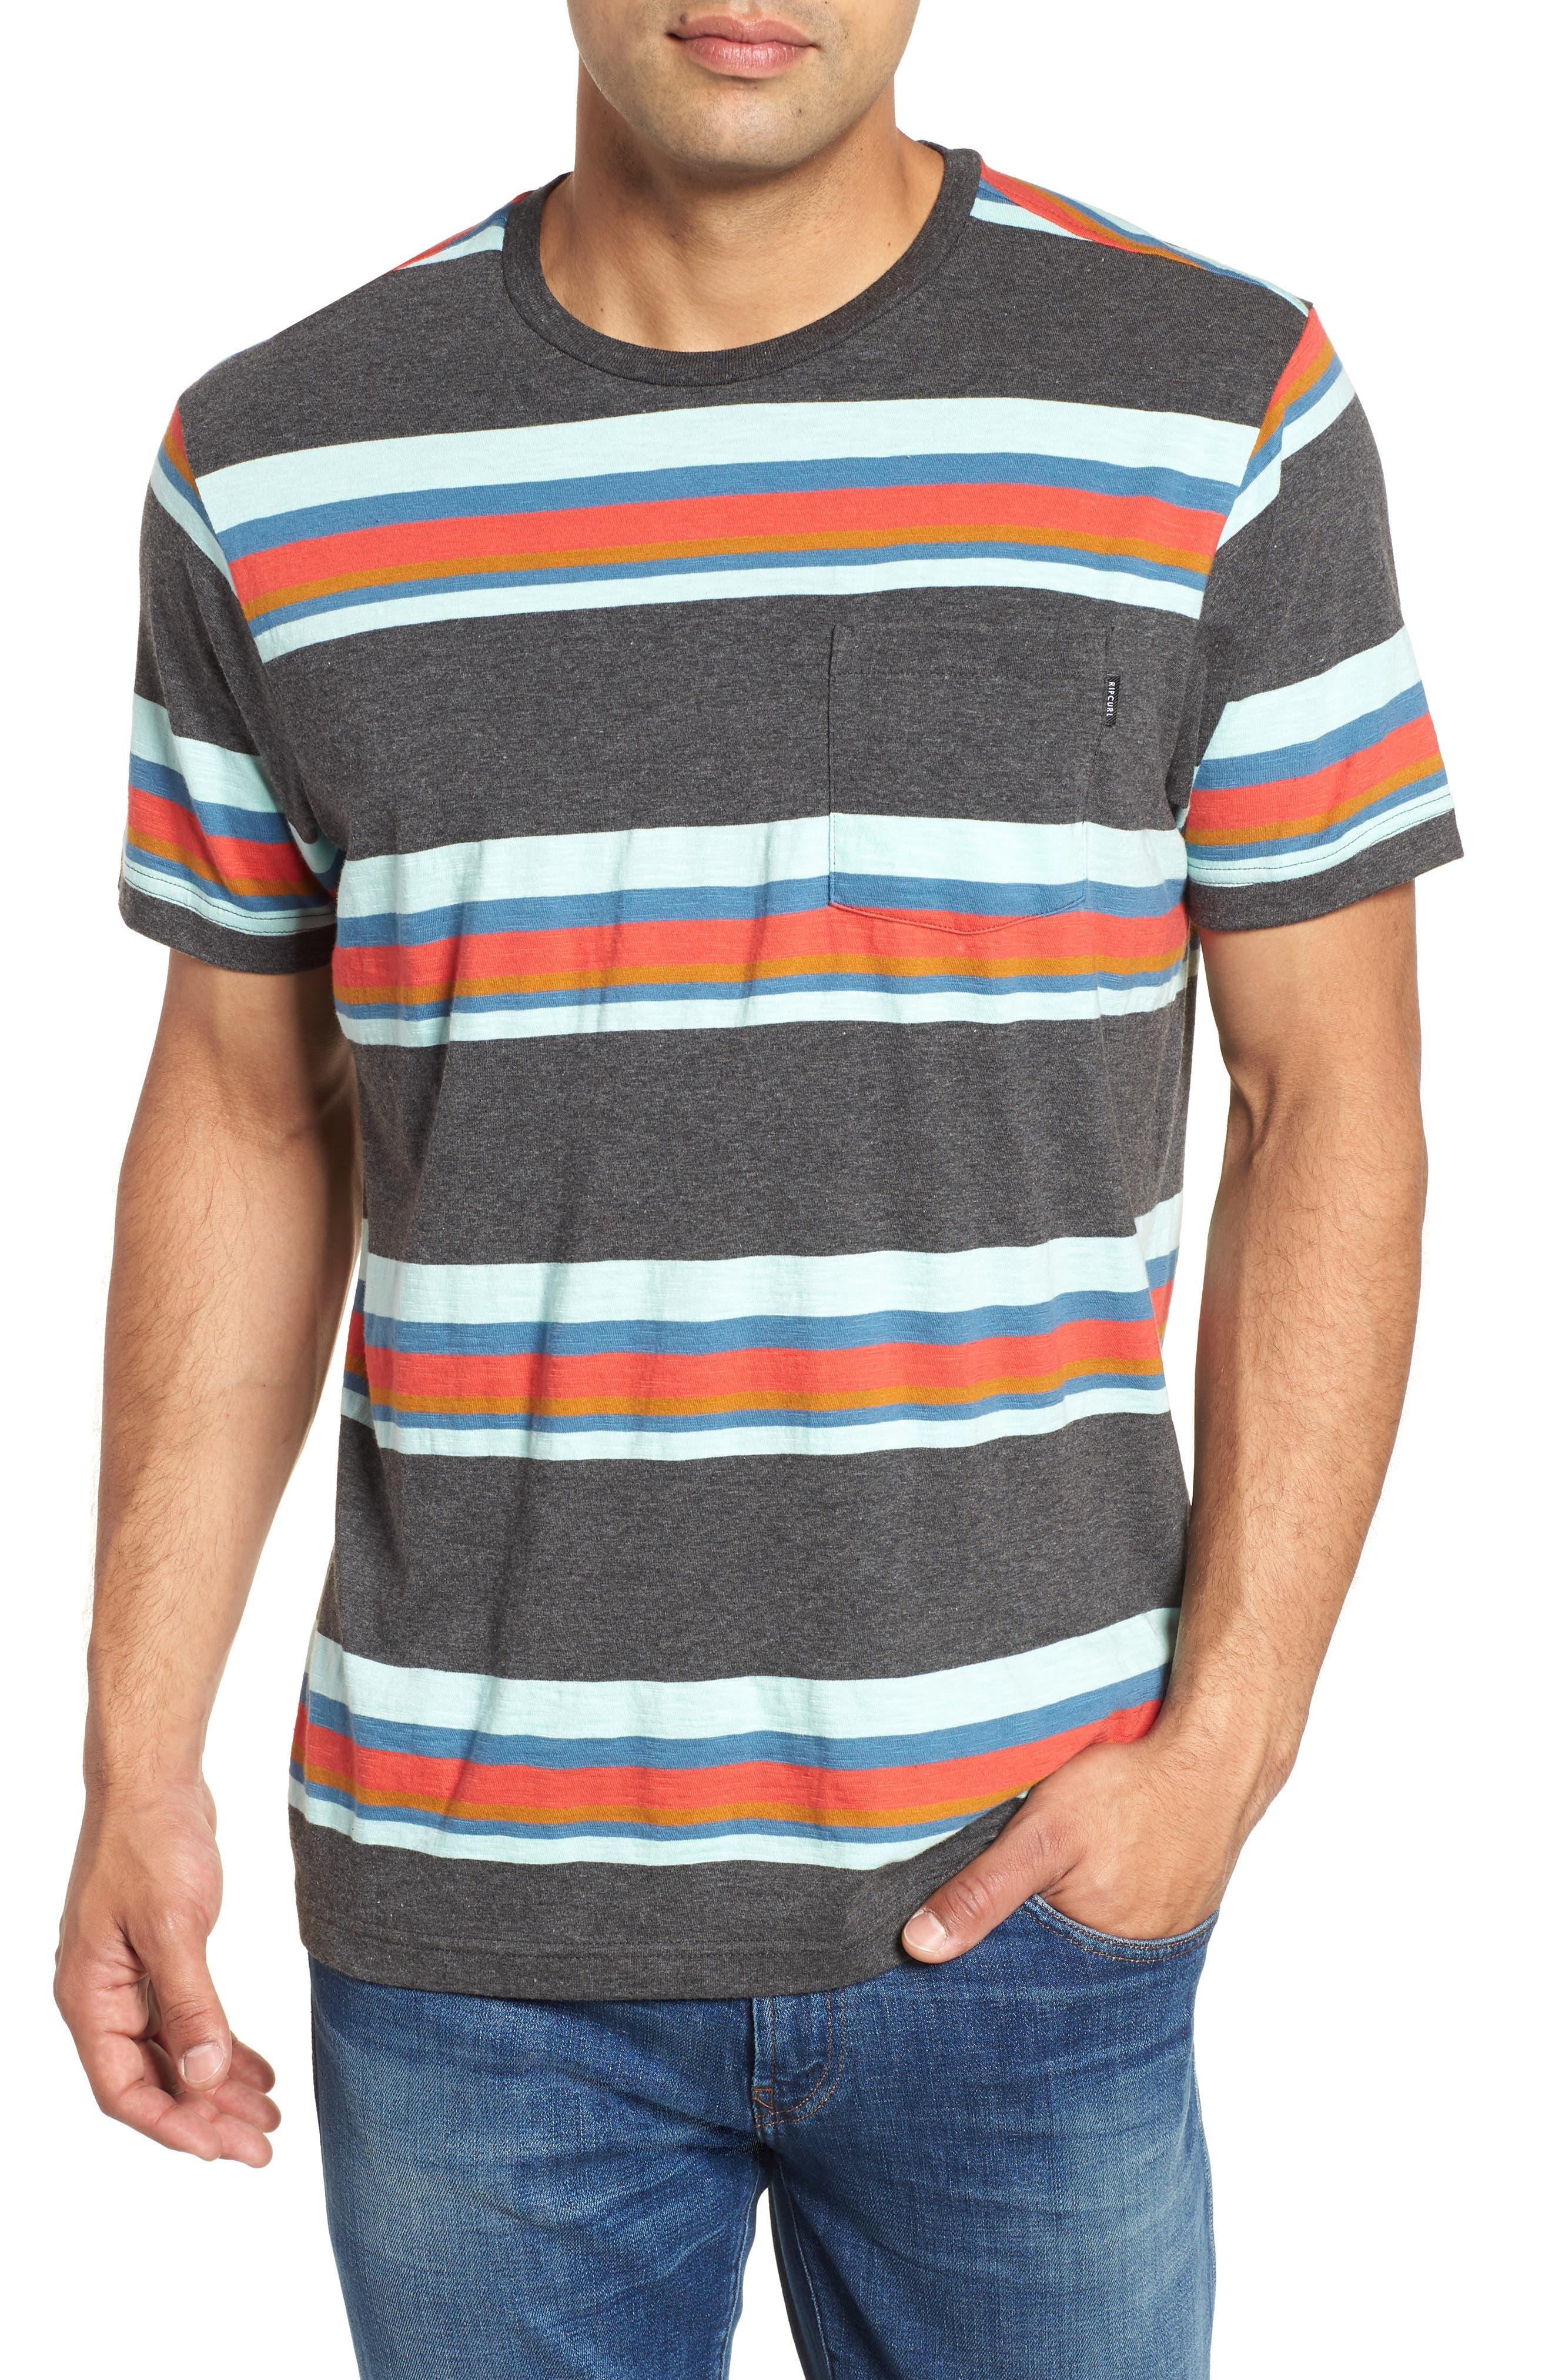 Prospect T-Shirt,                             Main thumbnail 1, color,                             020